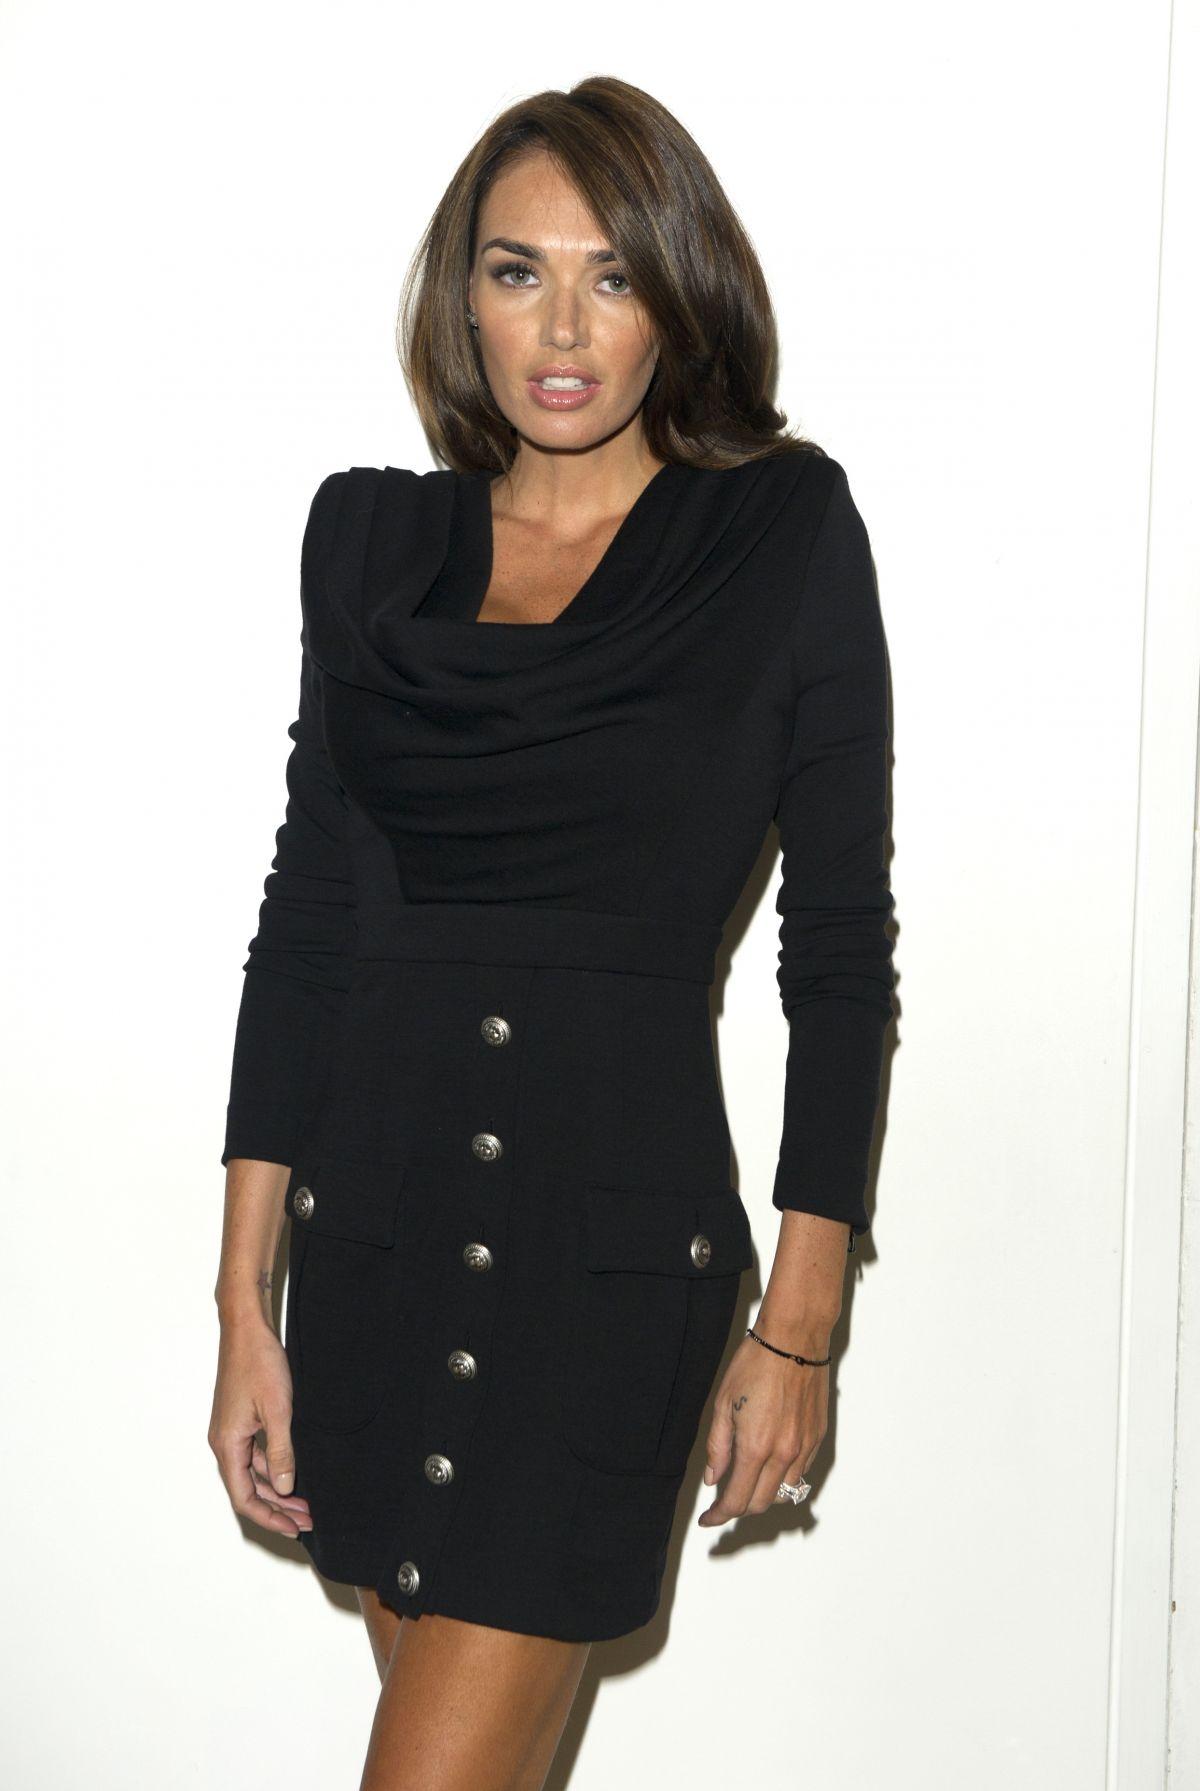 TAMARA ECCLESTONE at Julien Macdonald Fashion Show in London